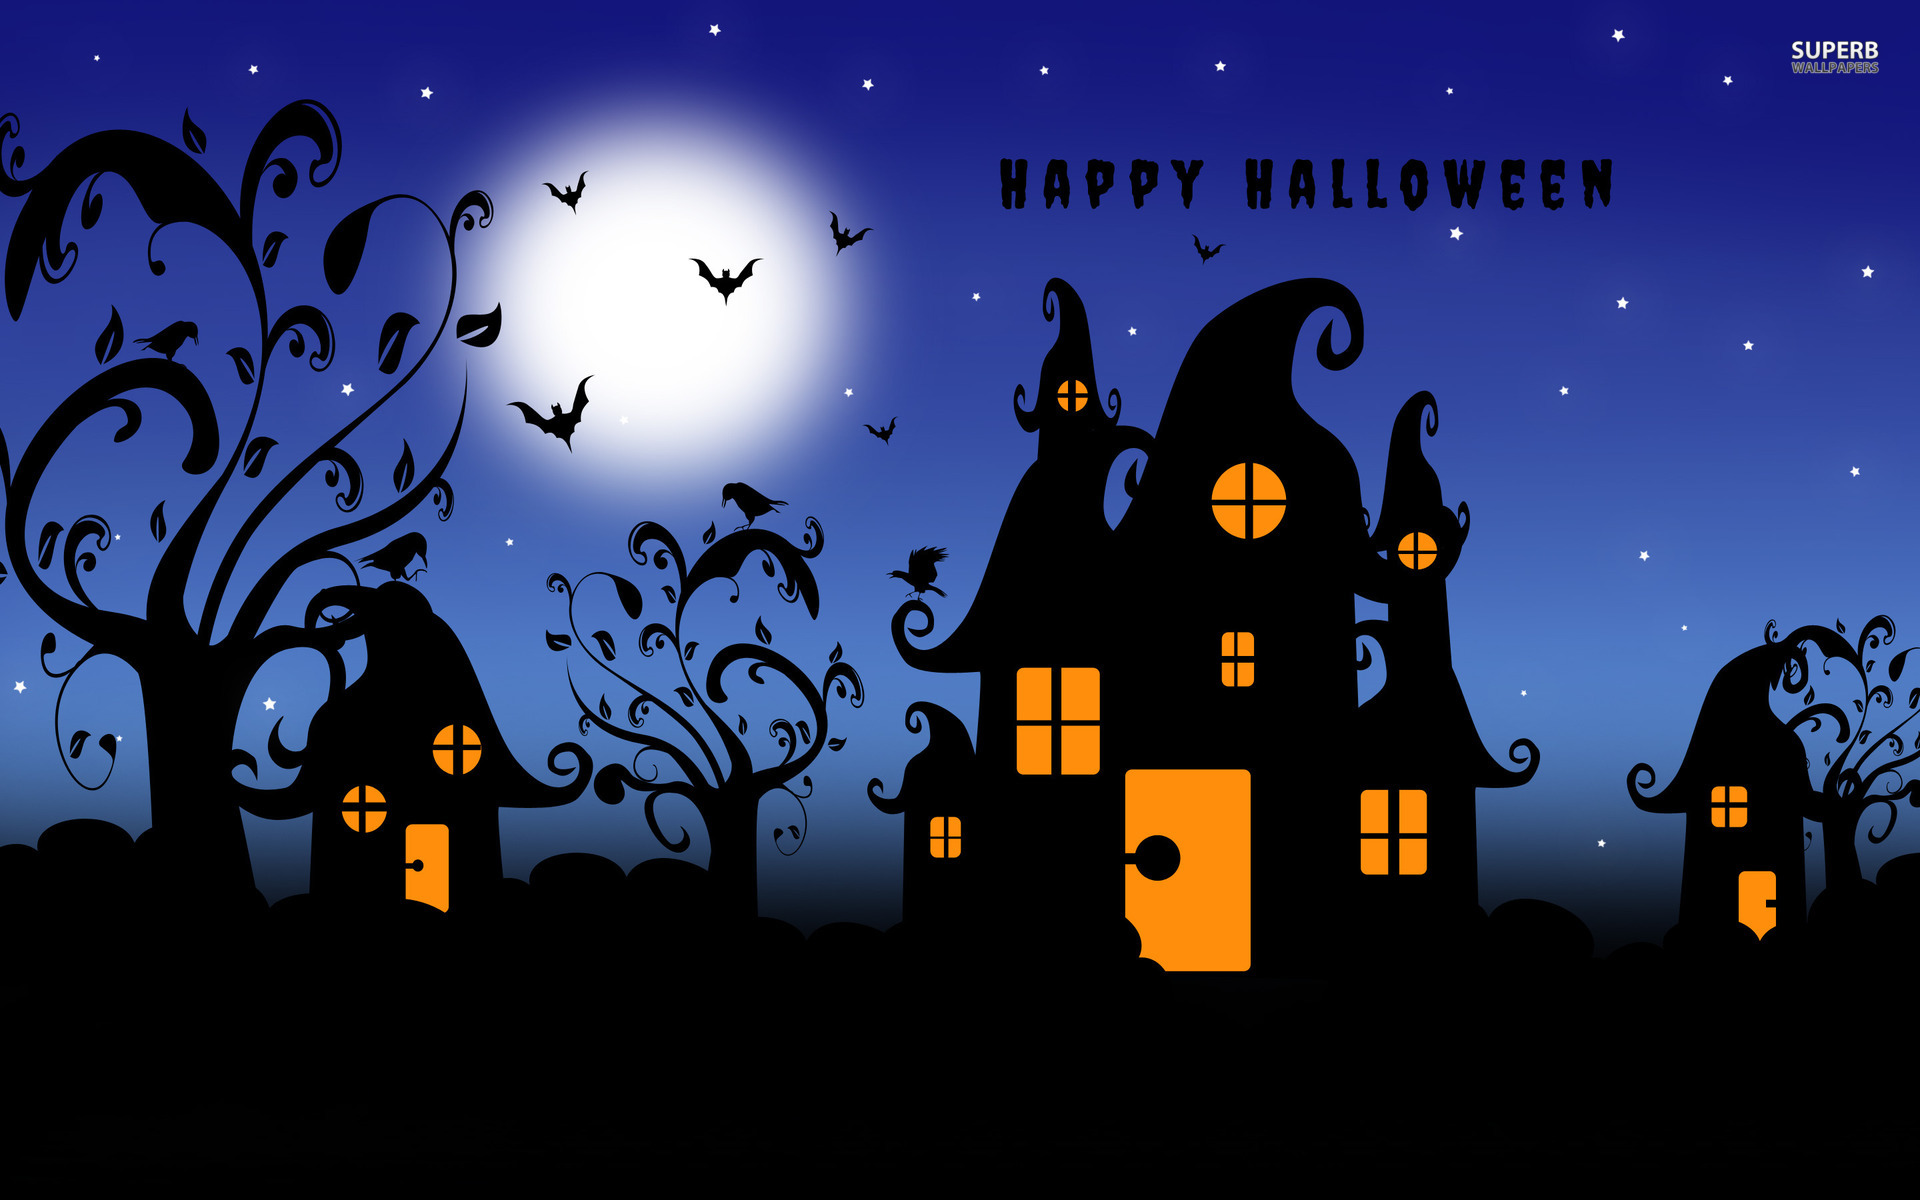 best happy halloween images – studentschillout